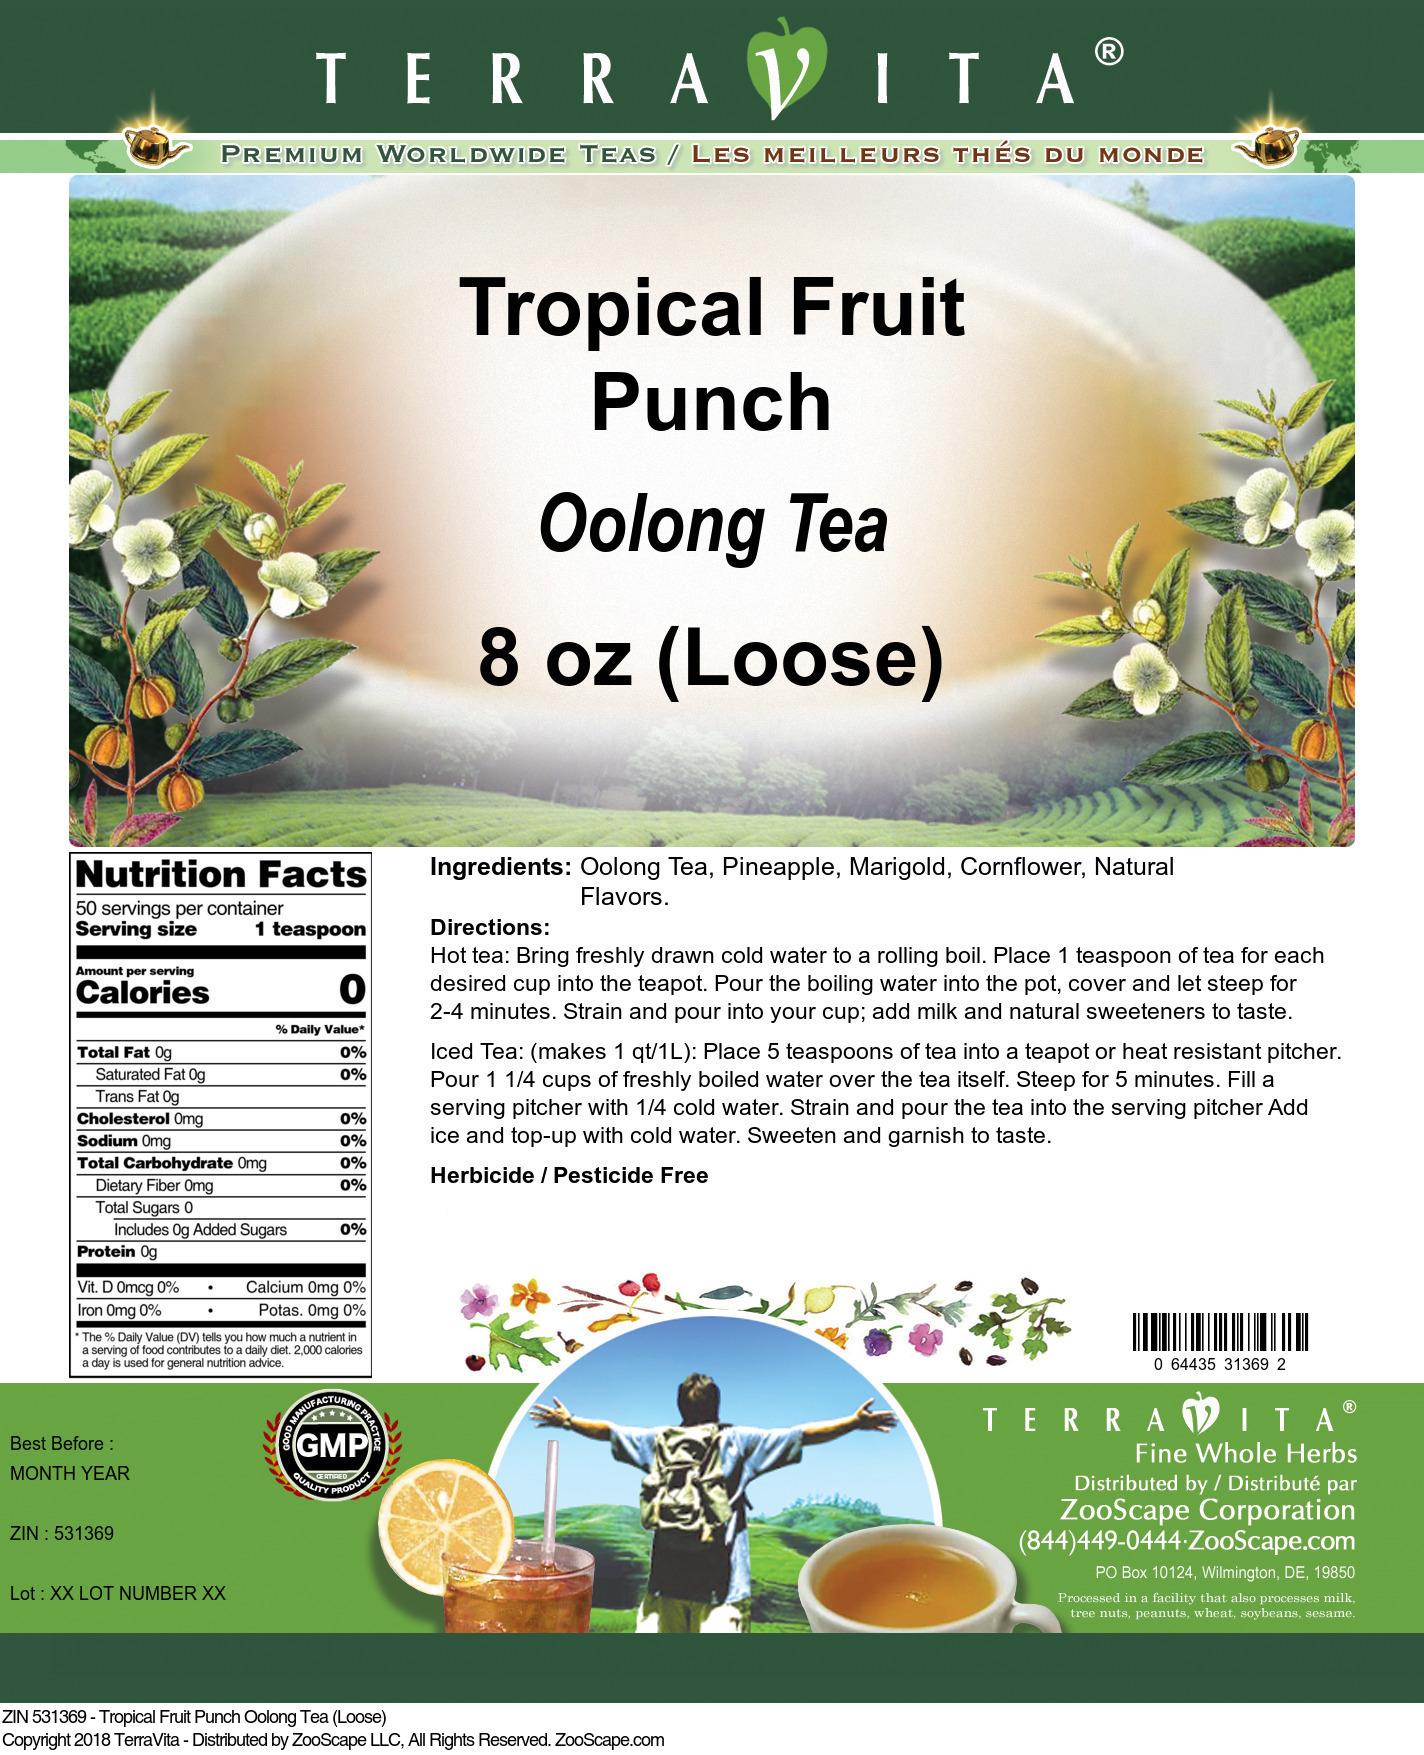 Tropical Fruit Punch Oolong Tea